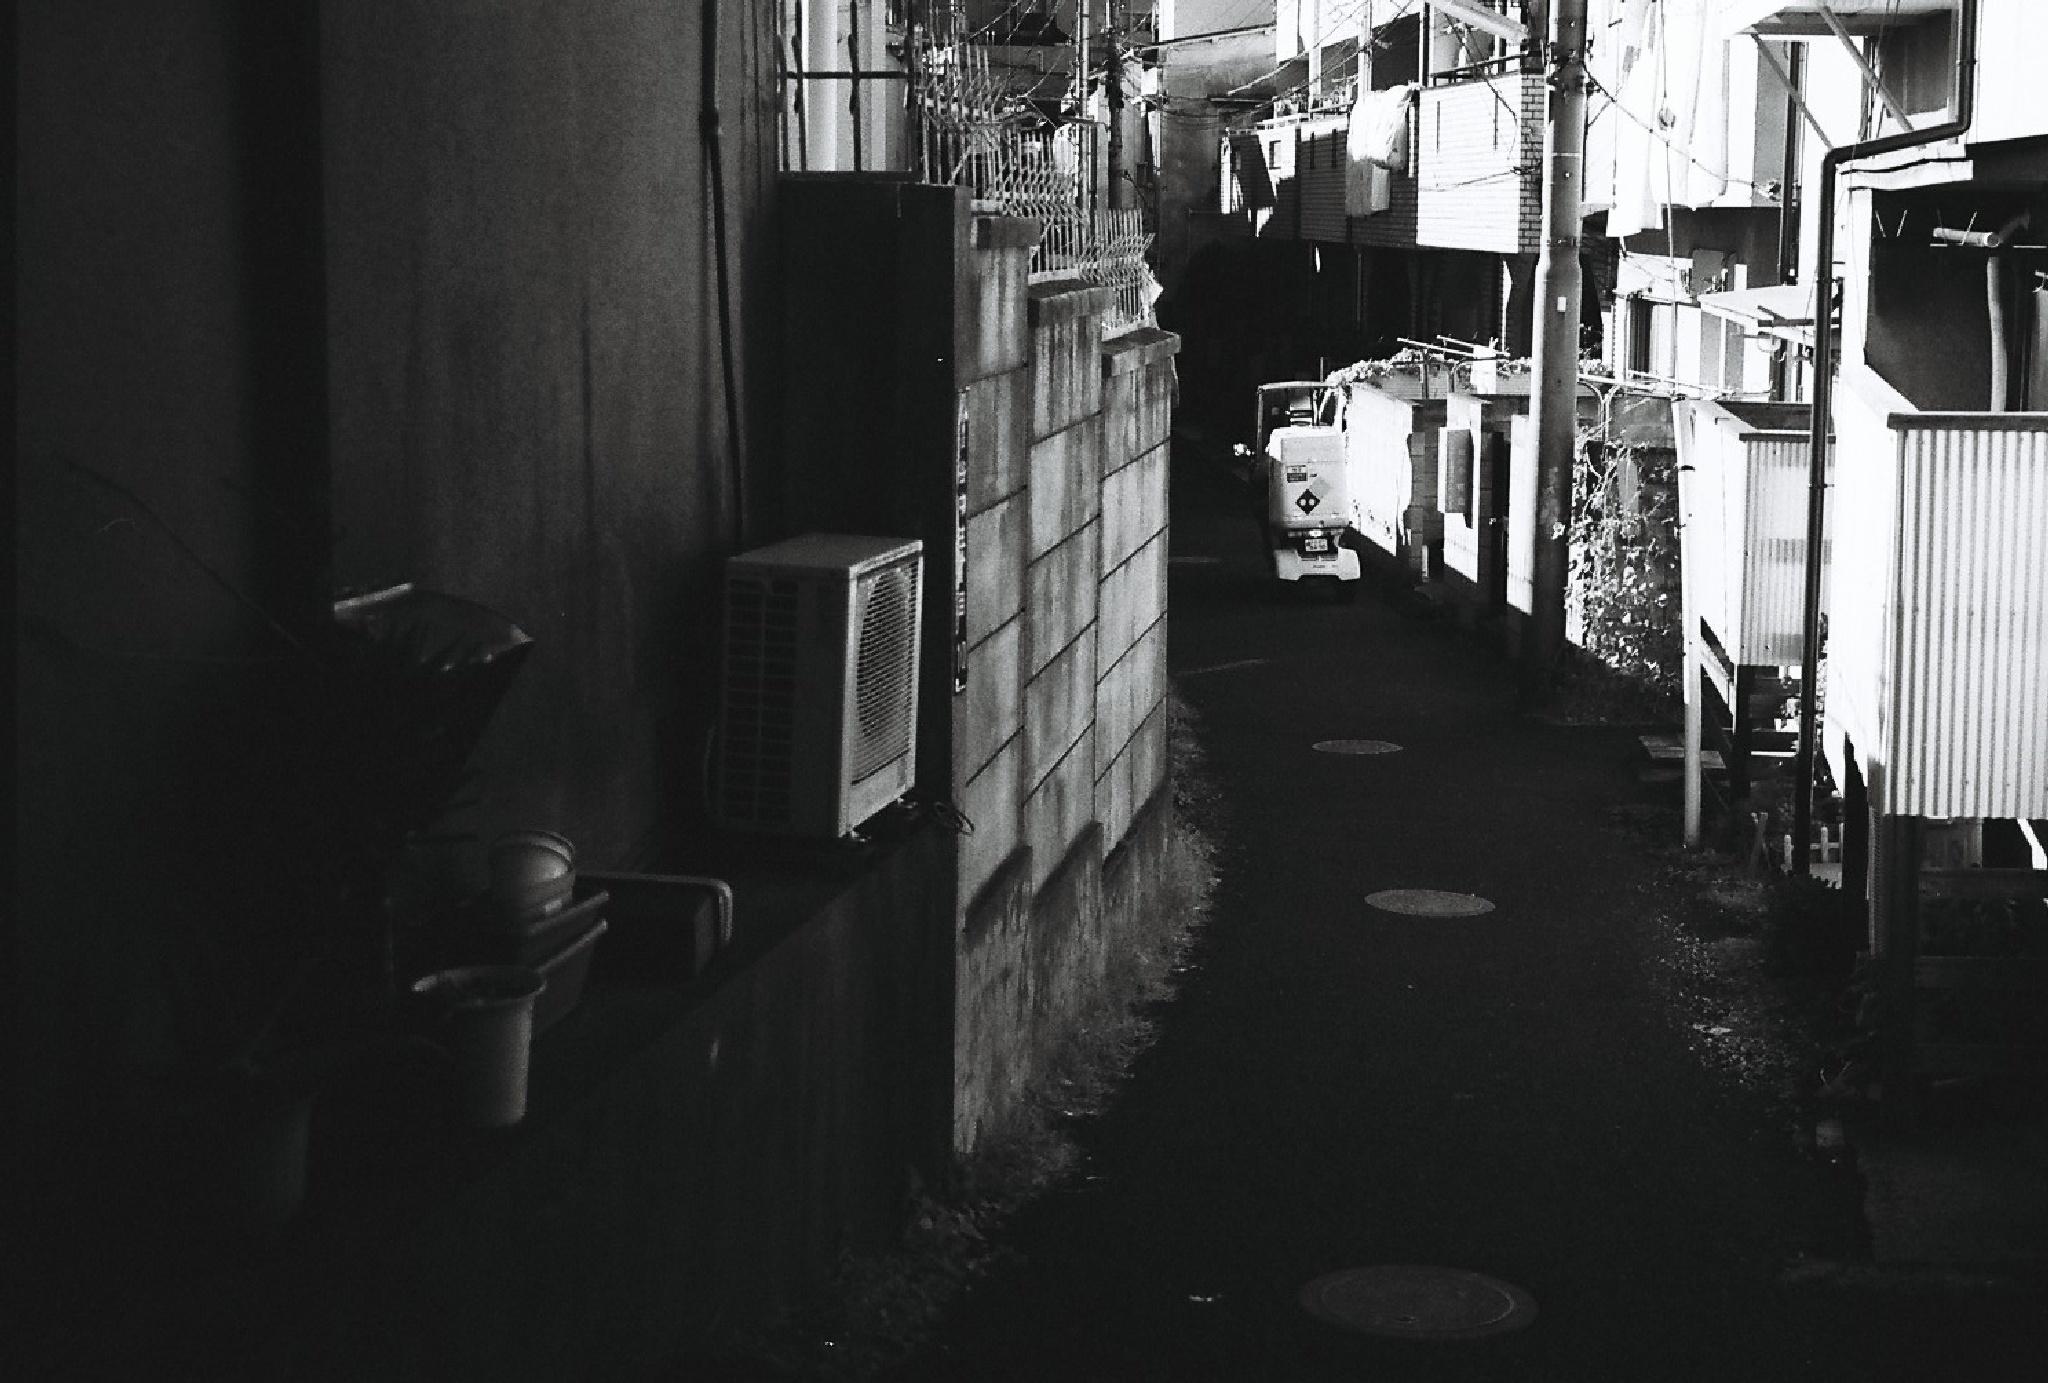 谷中 Yanaka by mot11